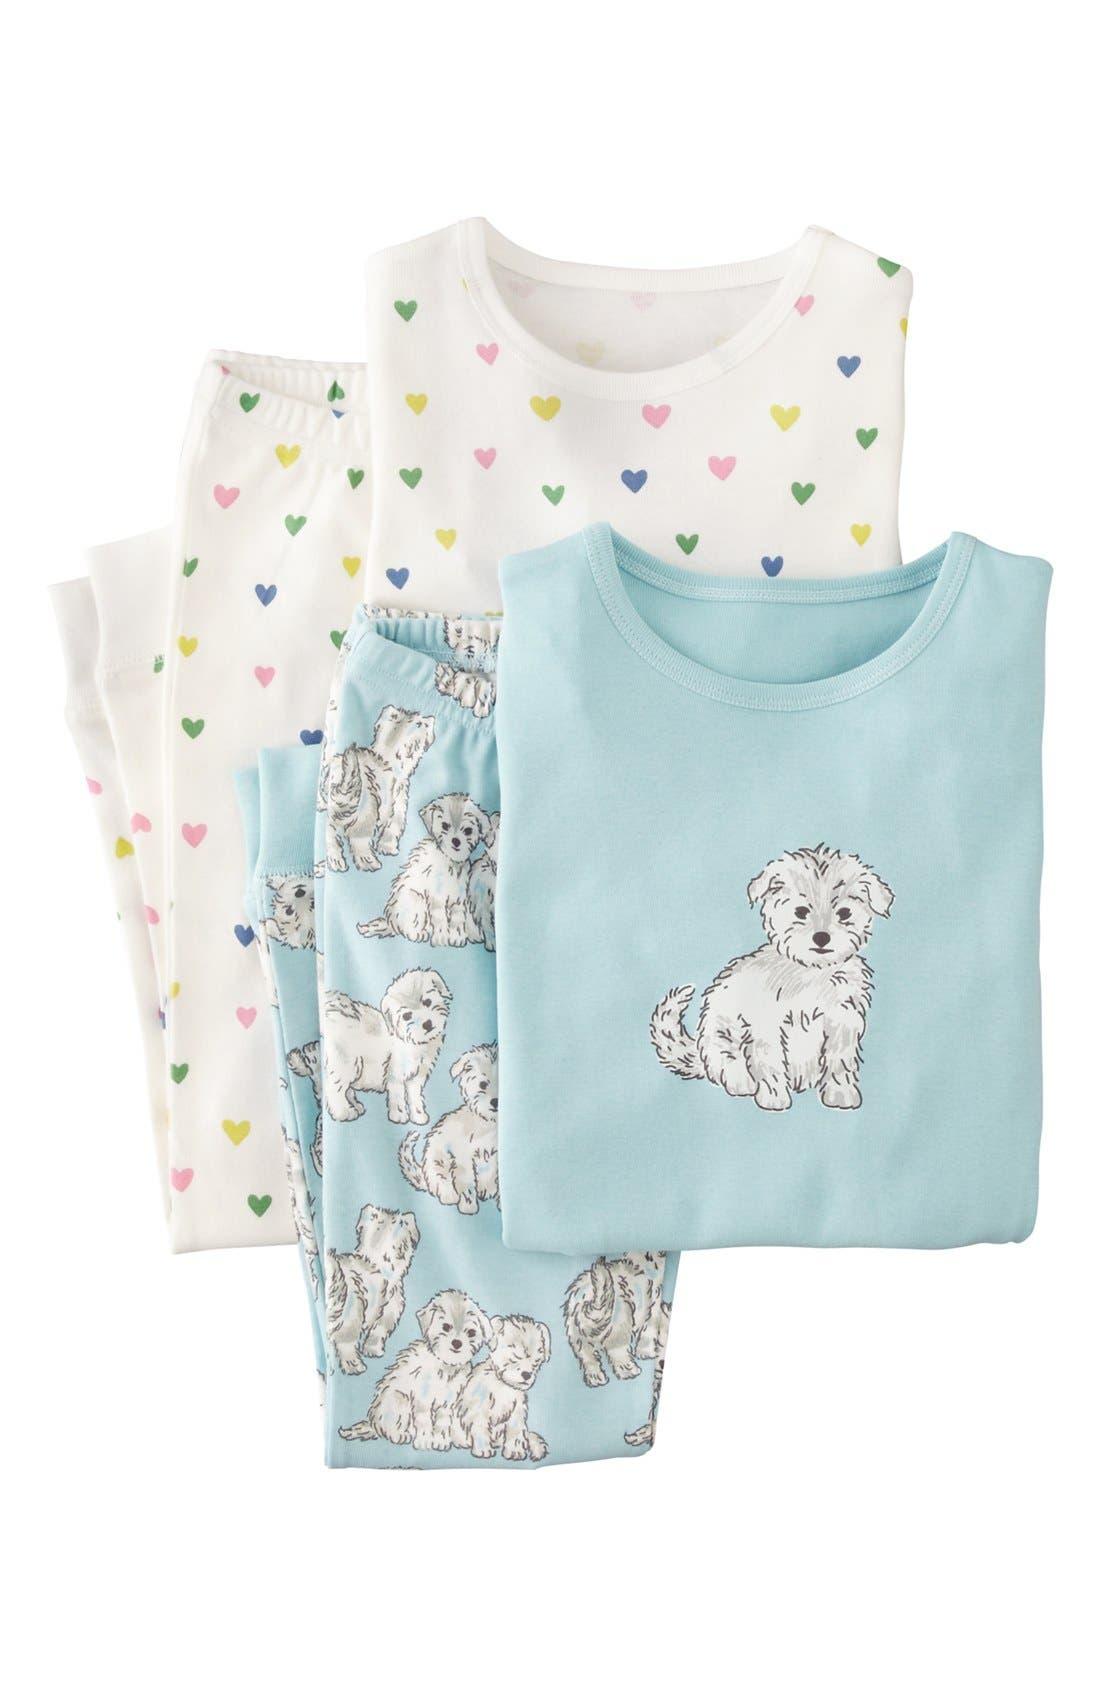 Alternate Image 1 Selected - Mini Boden Snug Fitting Pajamas (2-Pack) (Toddler Girls, Little Girls & Big Girls)